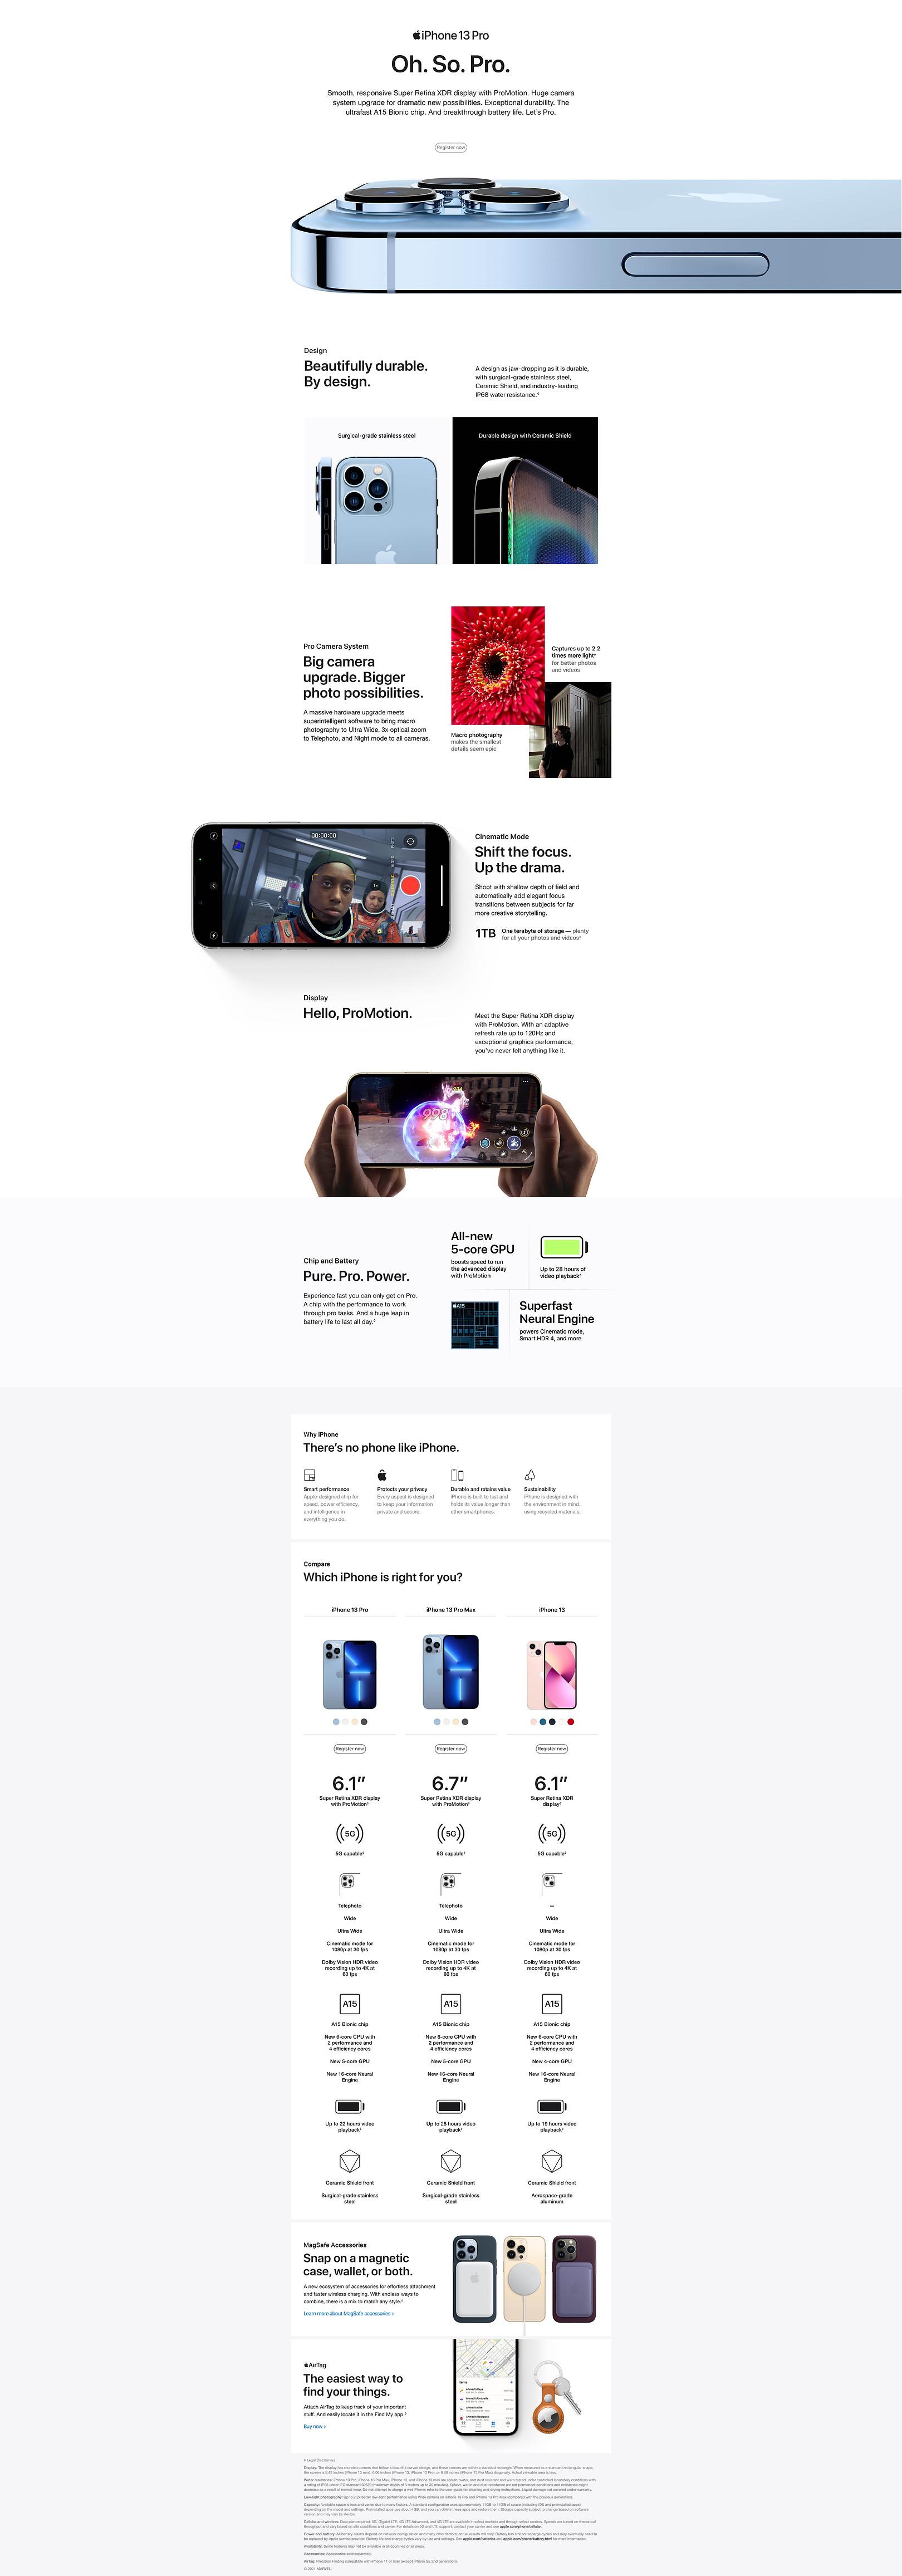 MEEN_iPhone13_Pro_no5G_Q421_Web_Marketing_Pages_L.jpg